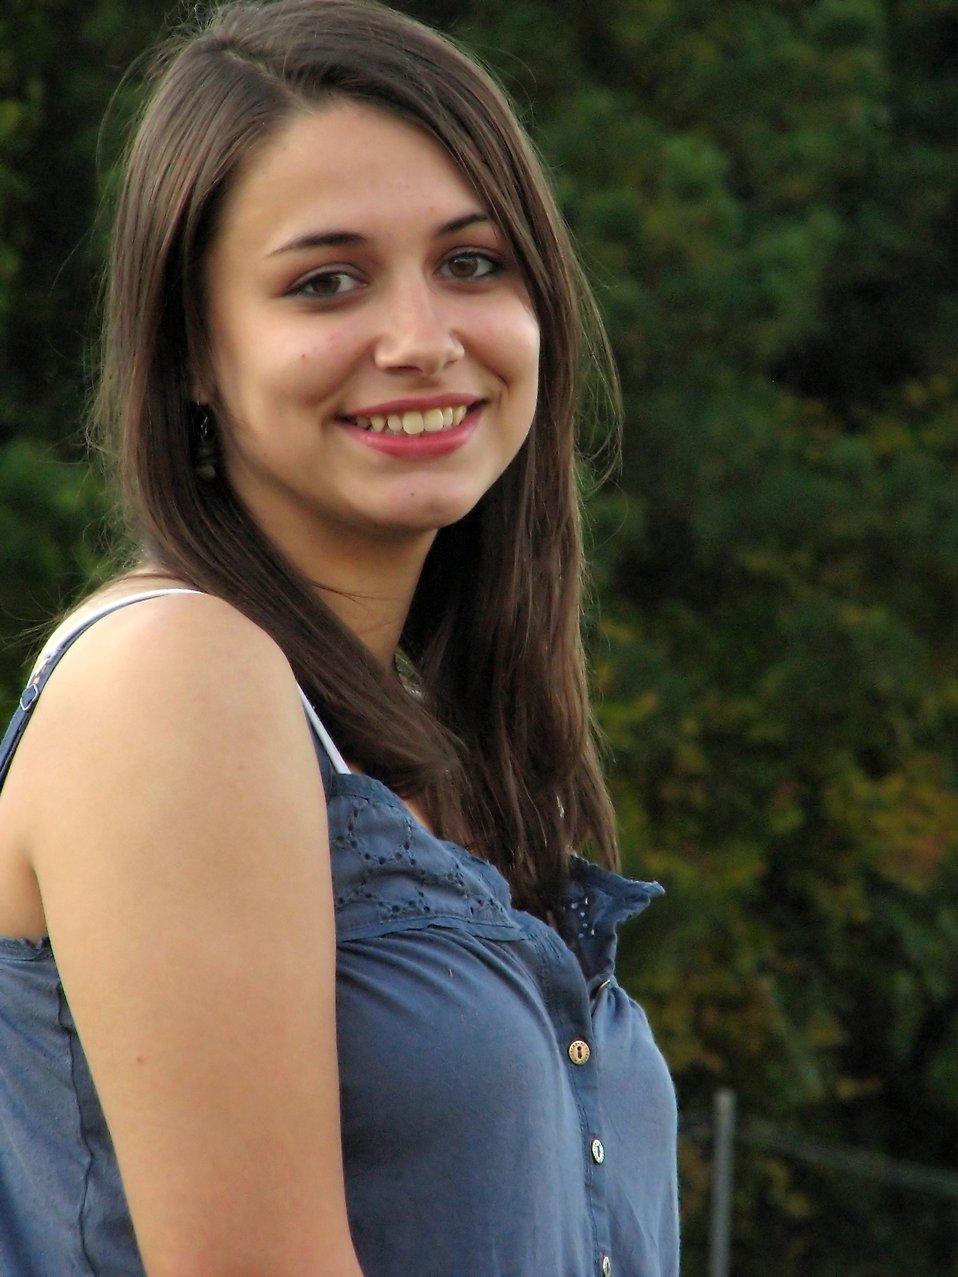 Girl Beautiful | Free Stock Photo | Outdoor portrait of a ... on Beautiful Teen Girl  id=30405